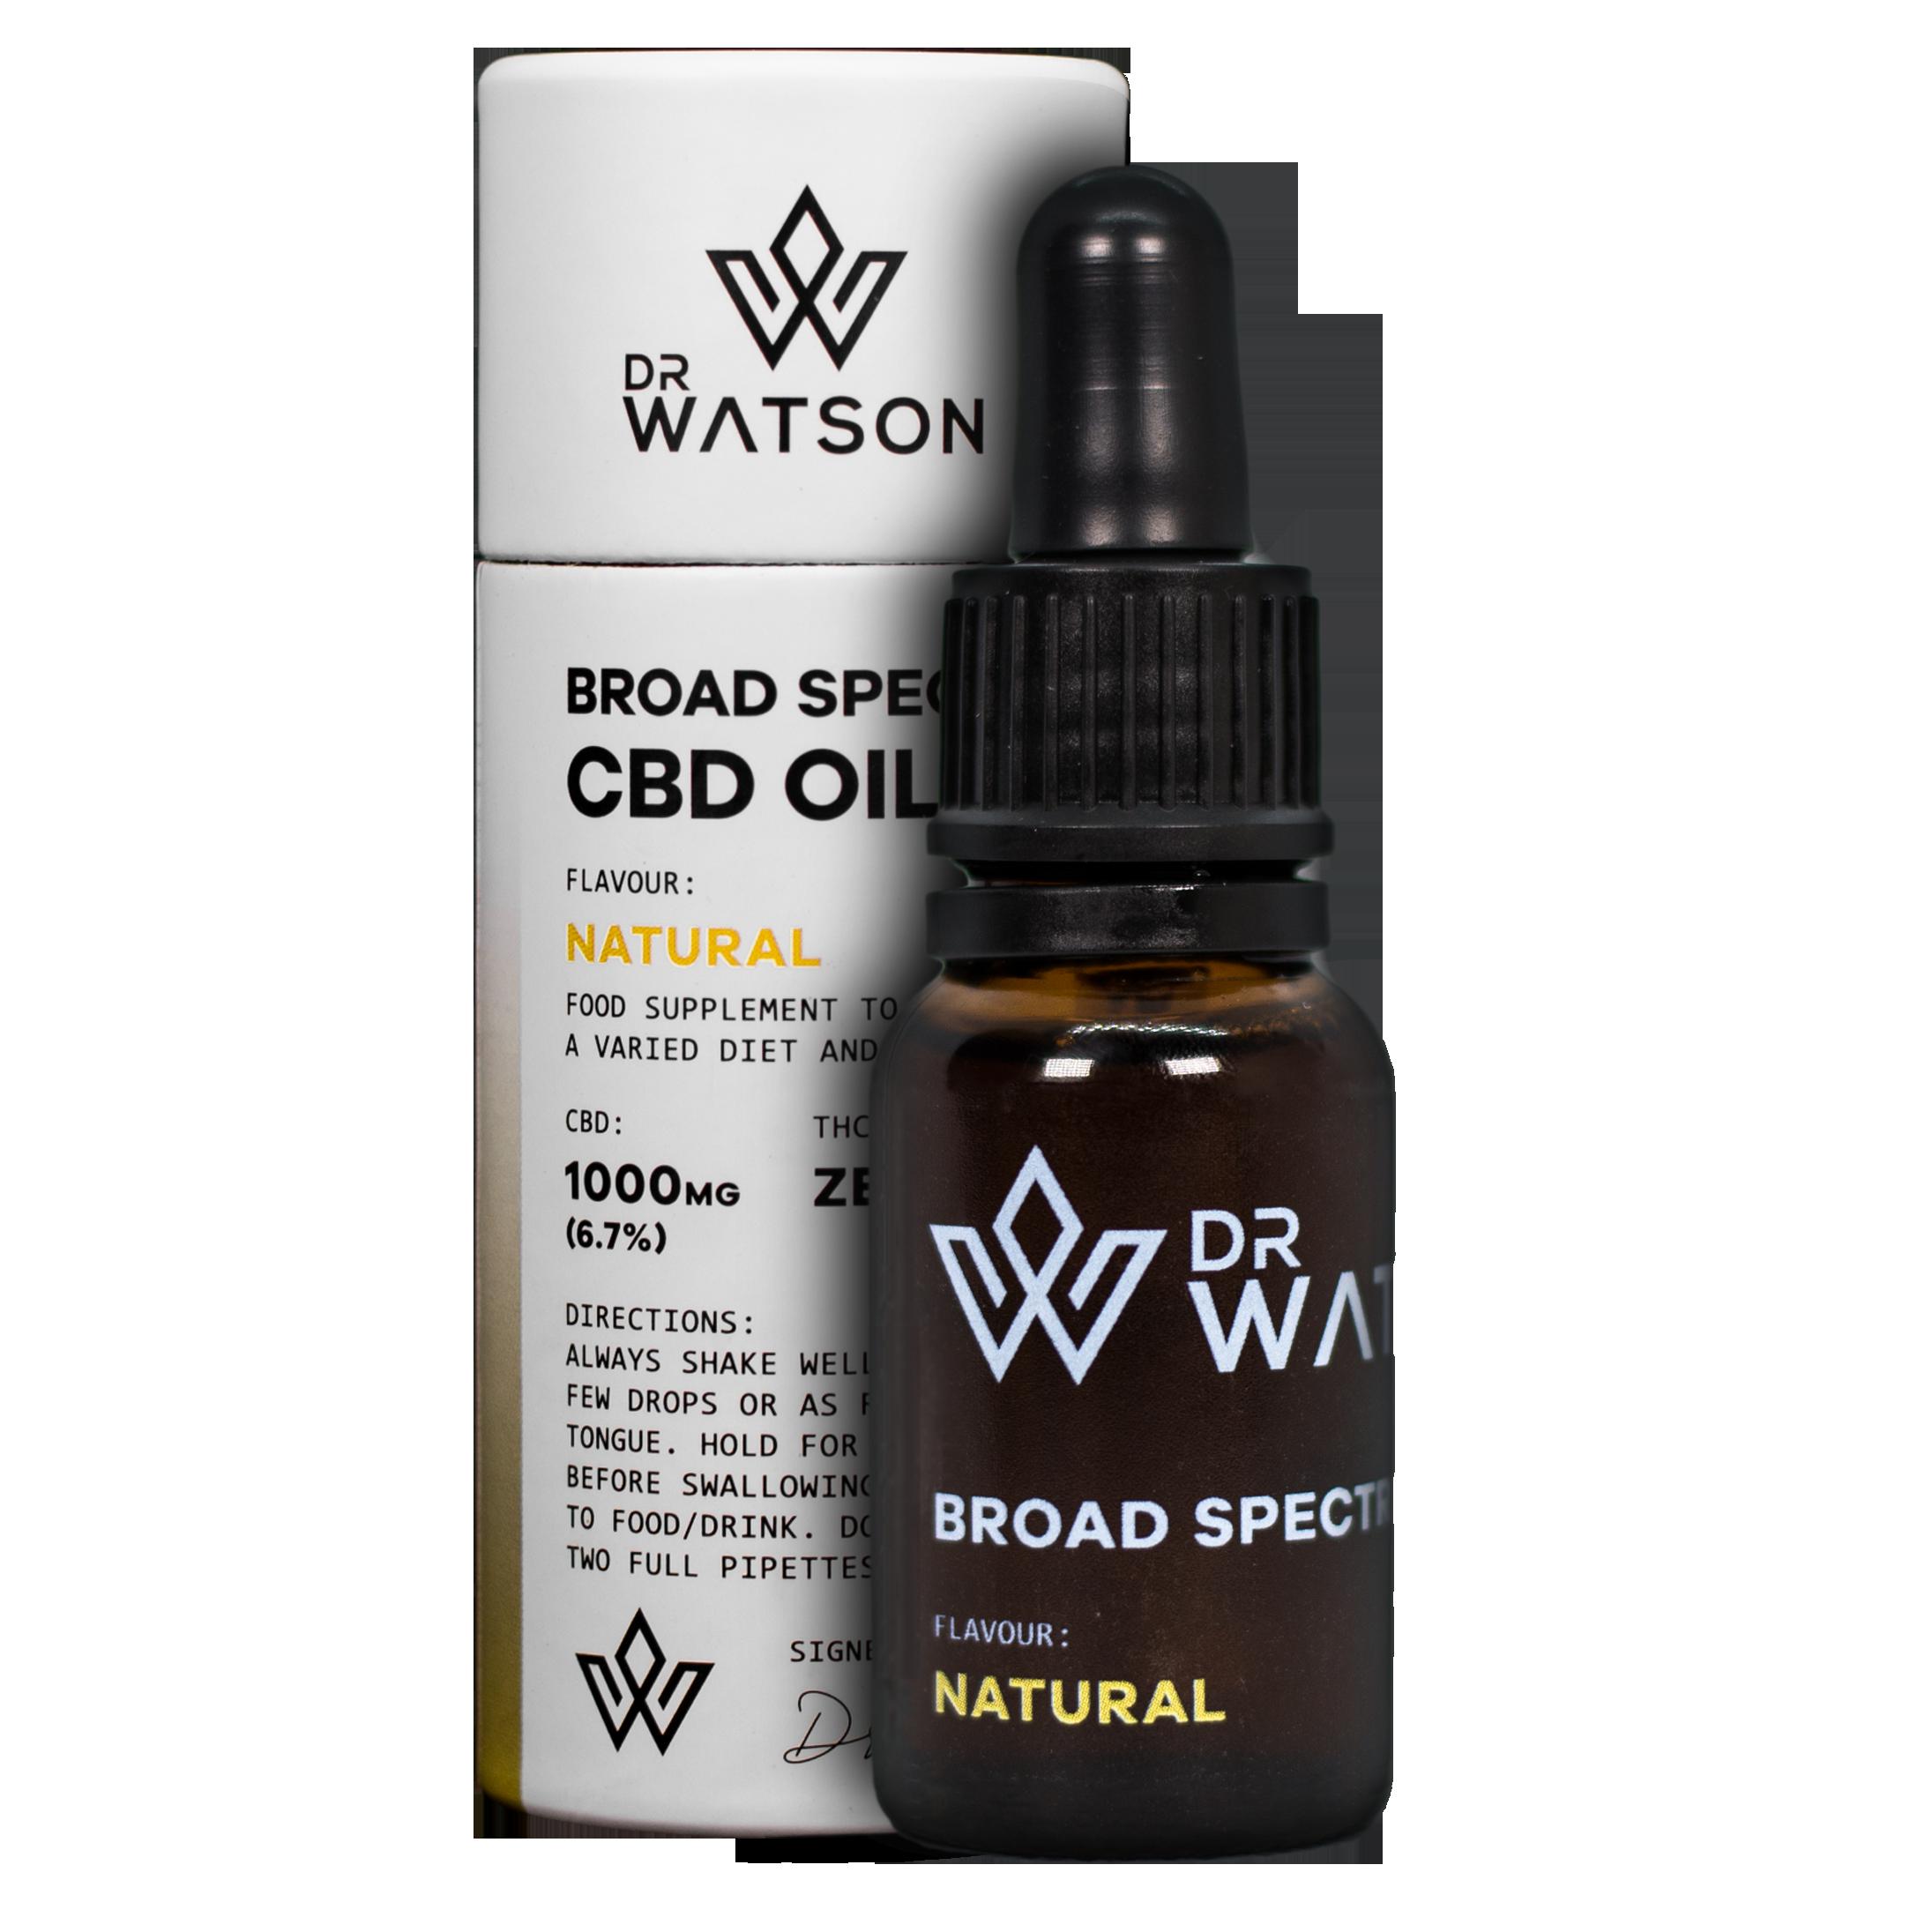 Broad Spectrum CBD Oil Supplements